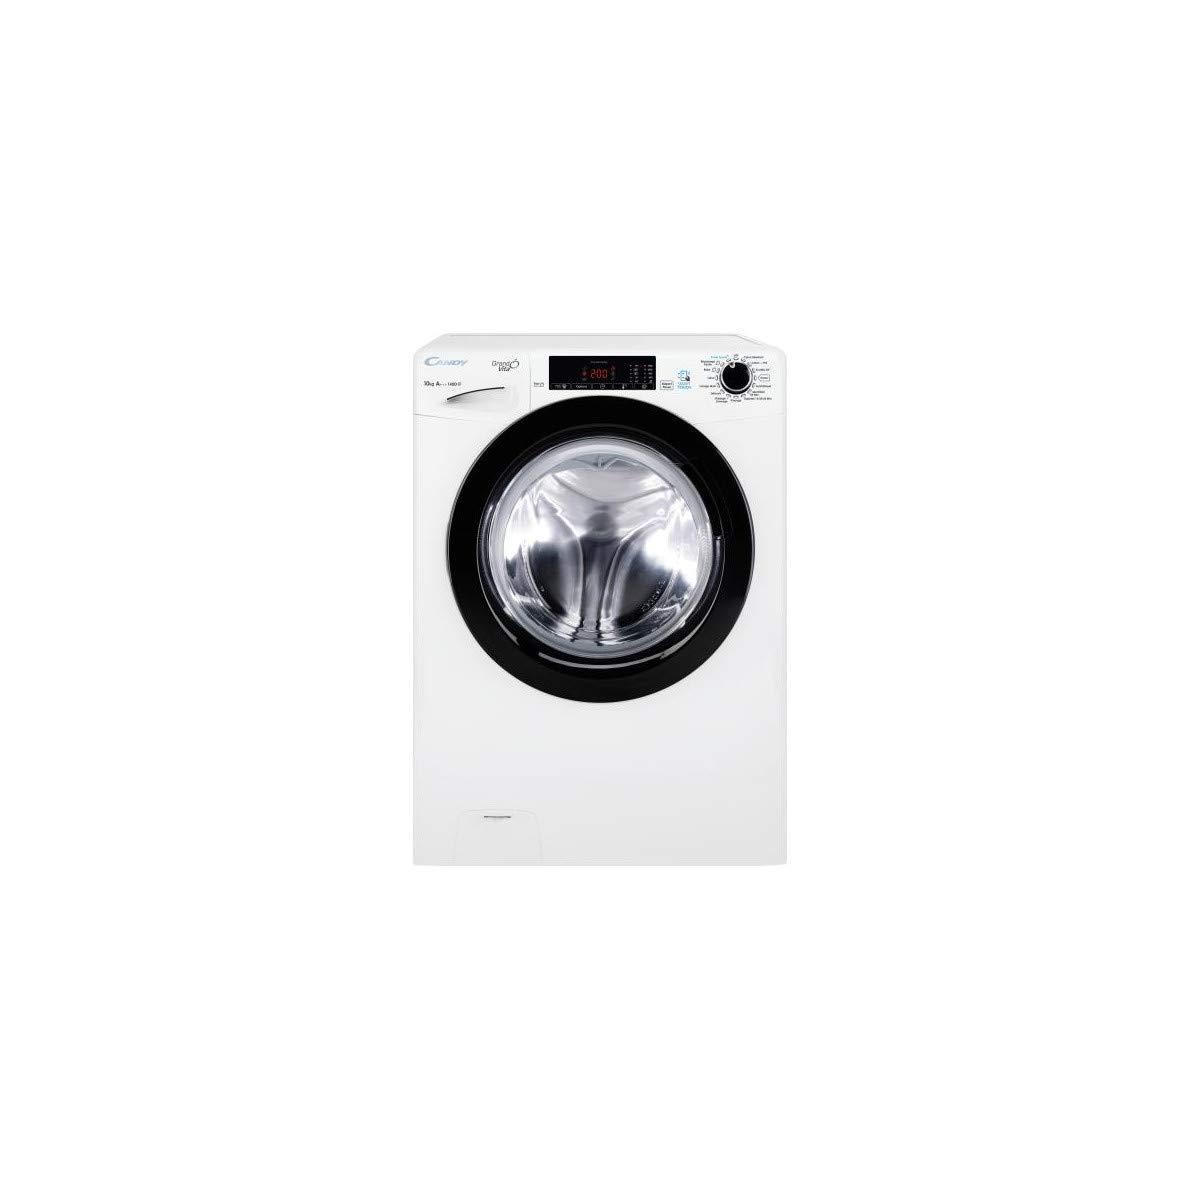 Waschmaschine-FRONTALE-10-kg-1400-Umin-Grand-Vita-Touch-Programmierung-Candy-GVS1410TB31-47